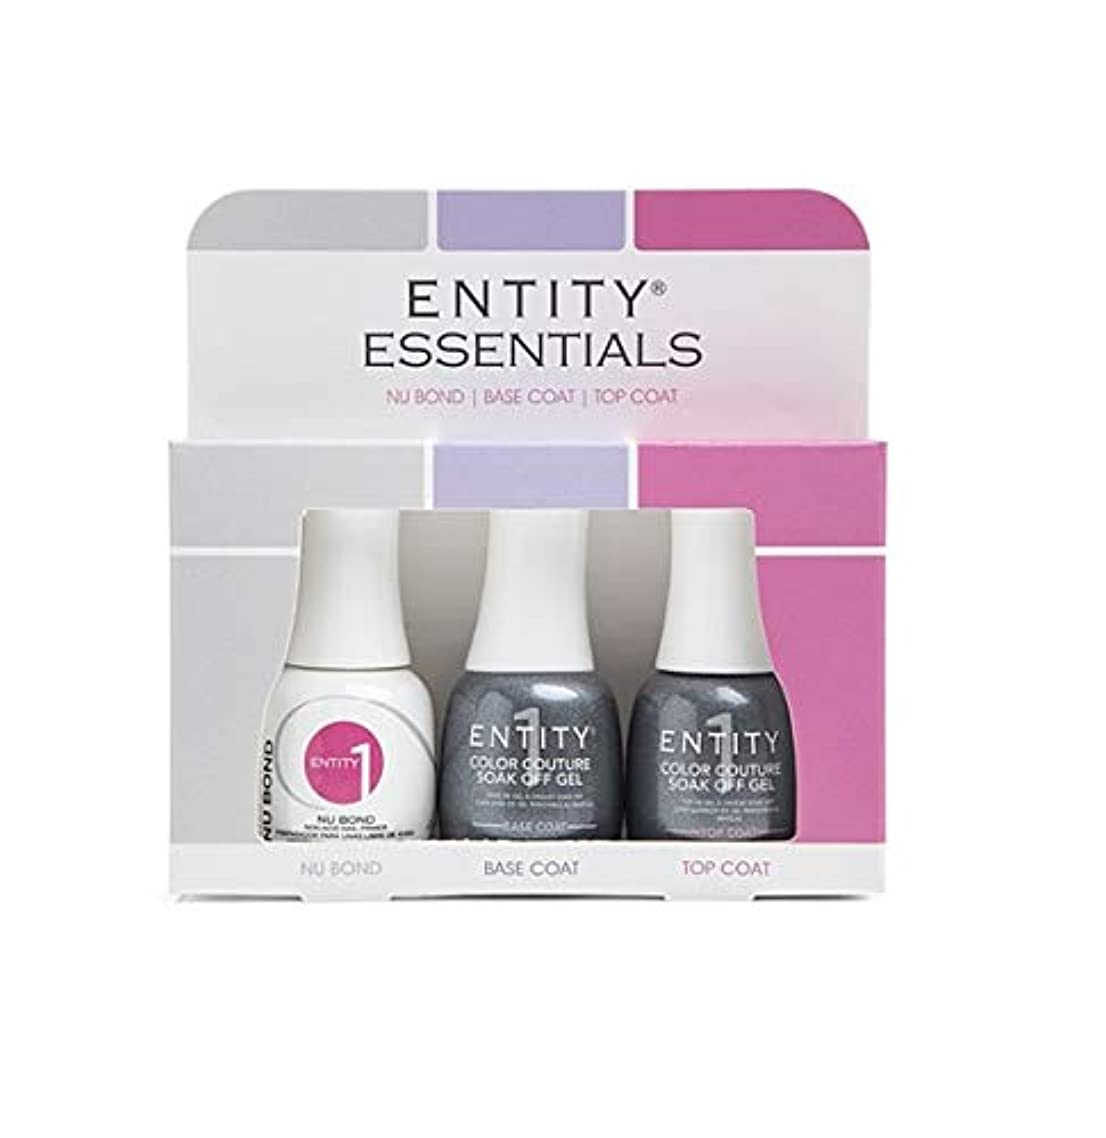 Entity One Color Couture Soak Off Gel - Essentials 3pc KIT